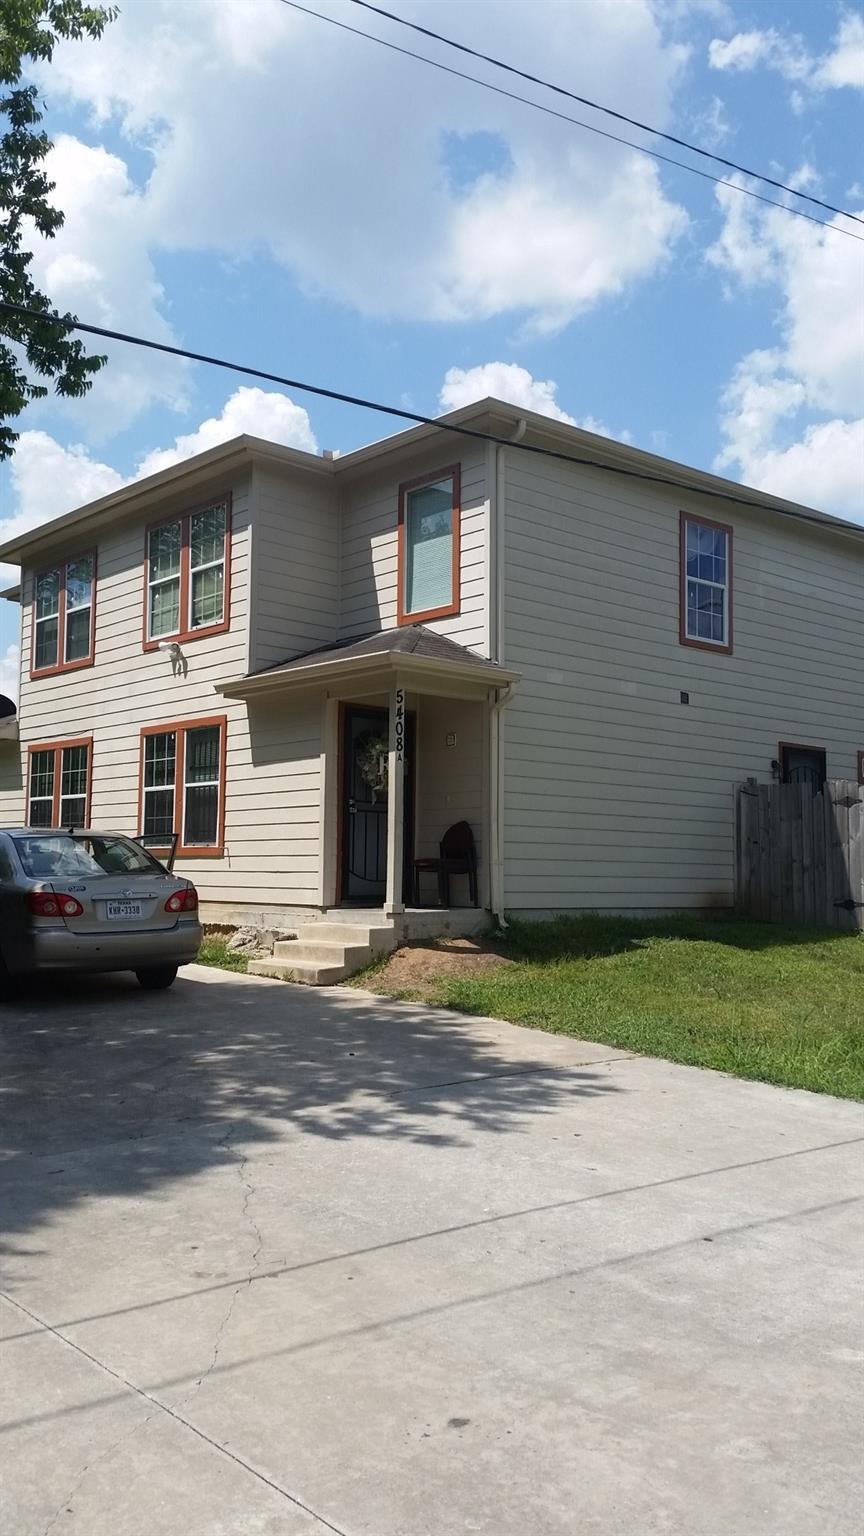 5408 Colt A/B Property Photo - Houston, TX real estate listing